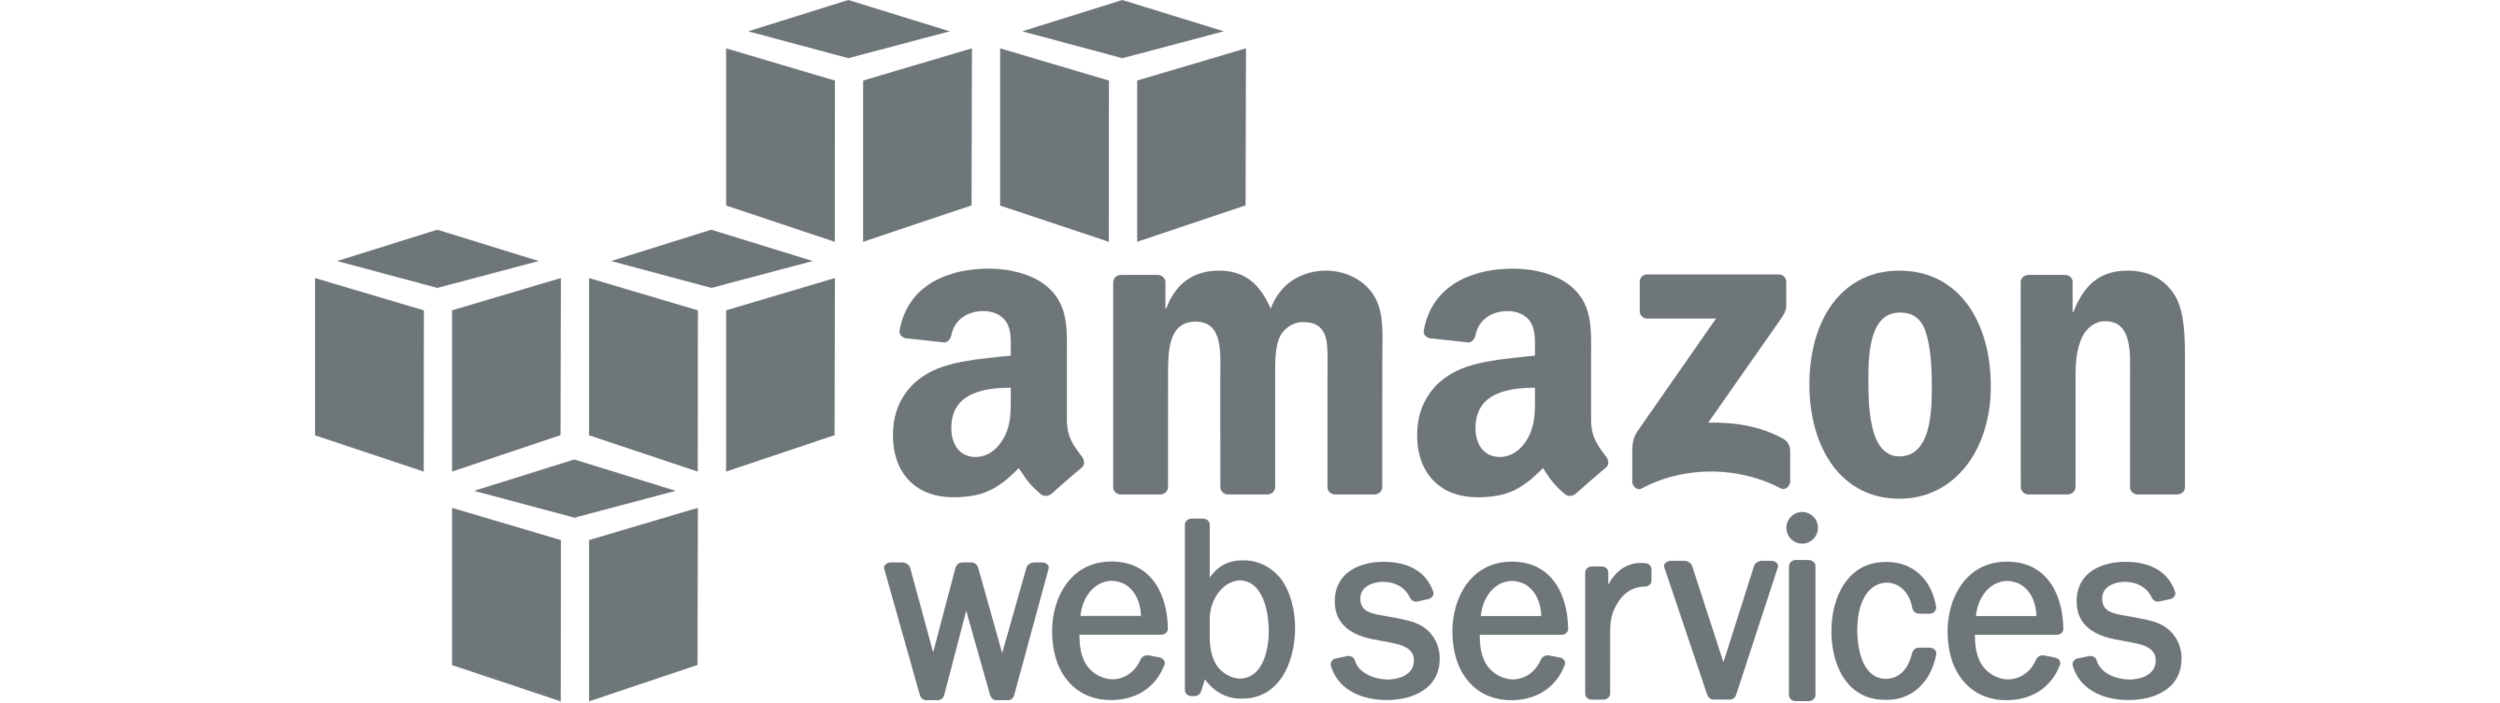 AmazonWebservices_Logo_grey.png